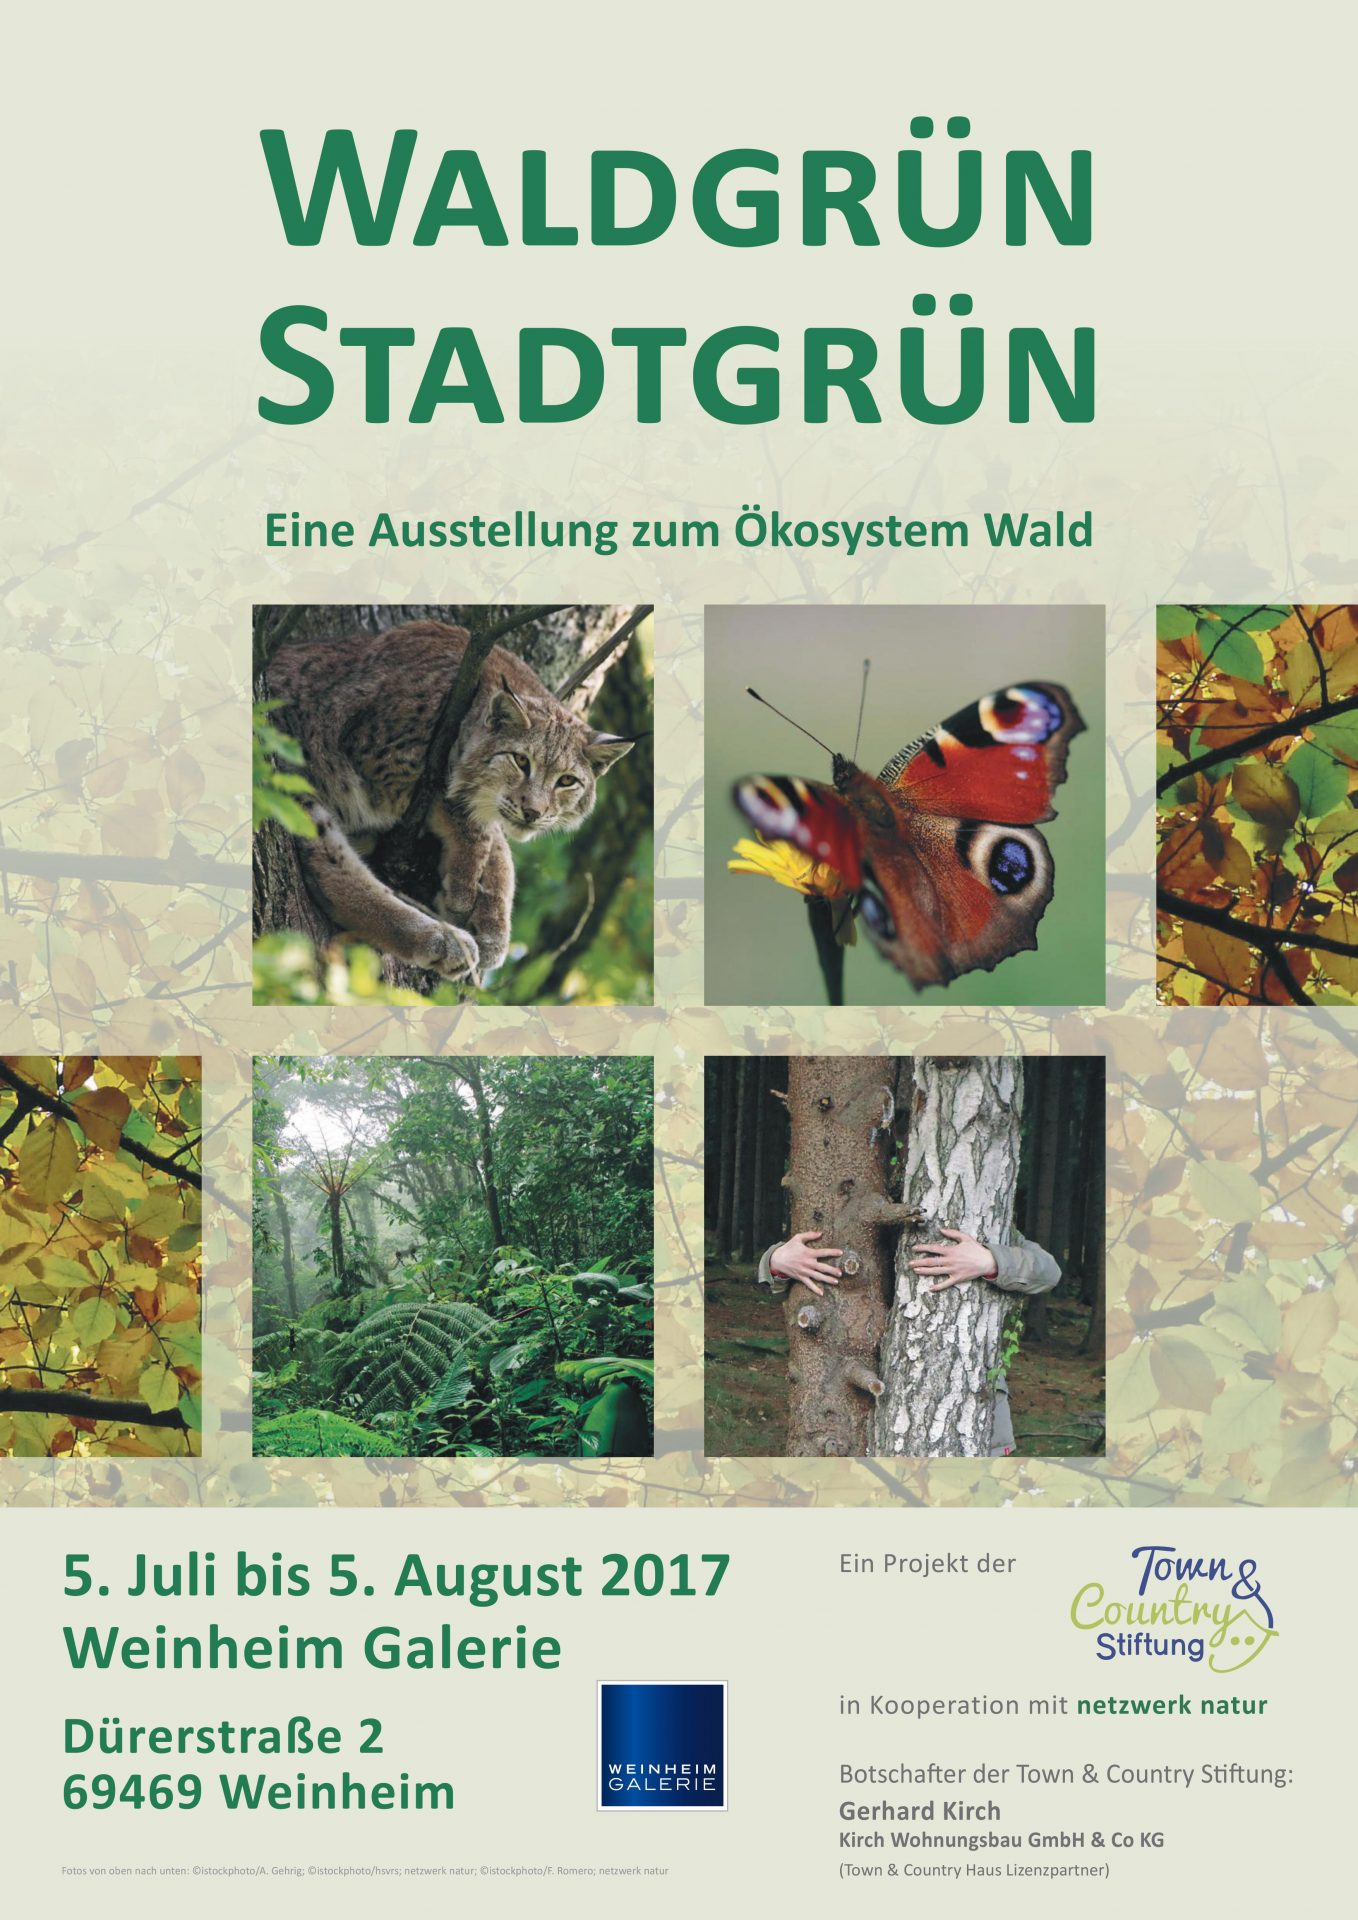 netzwerk natur, WALDGRÜN - STADTGRÜN, Ausstellungsplakat Weinheim Galerie